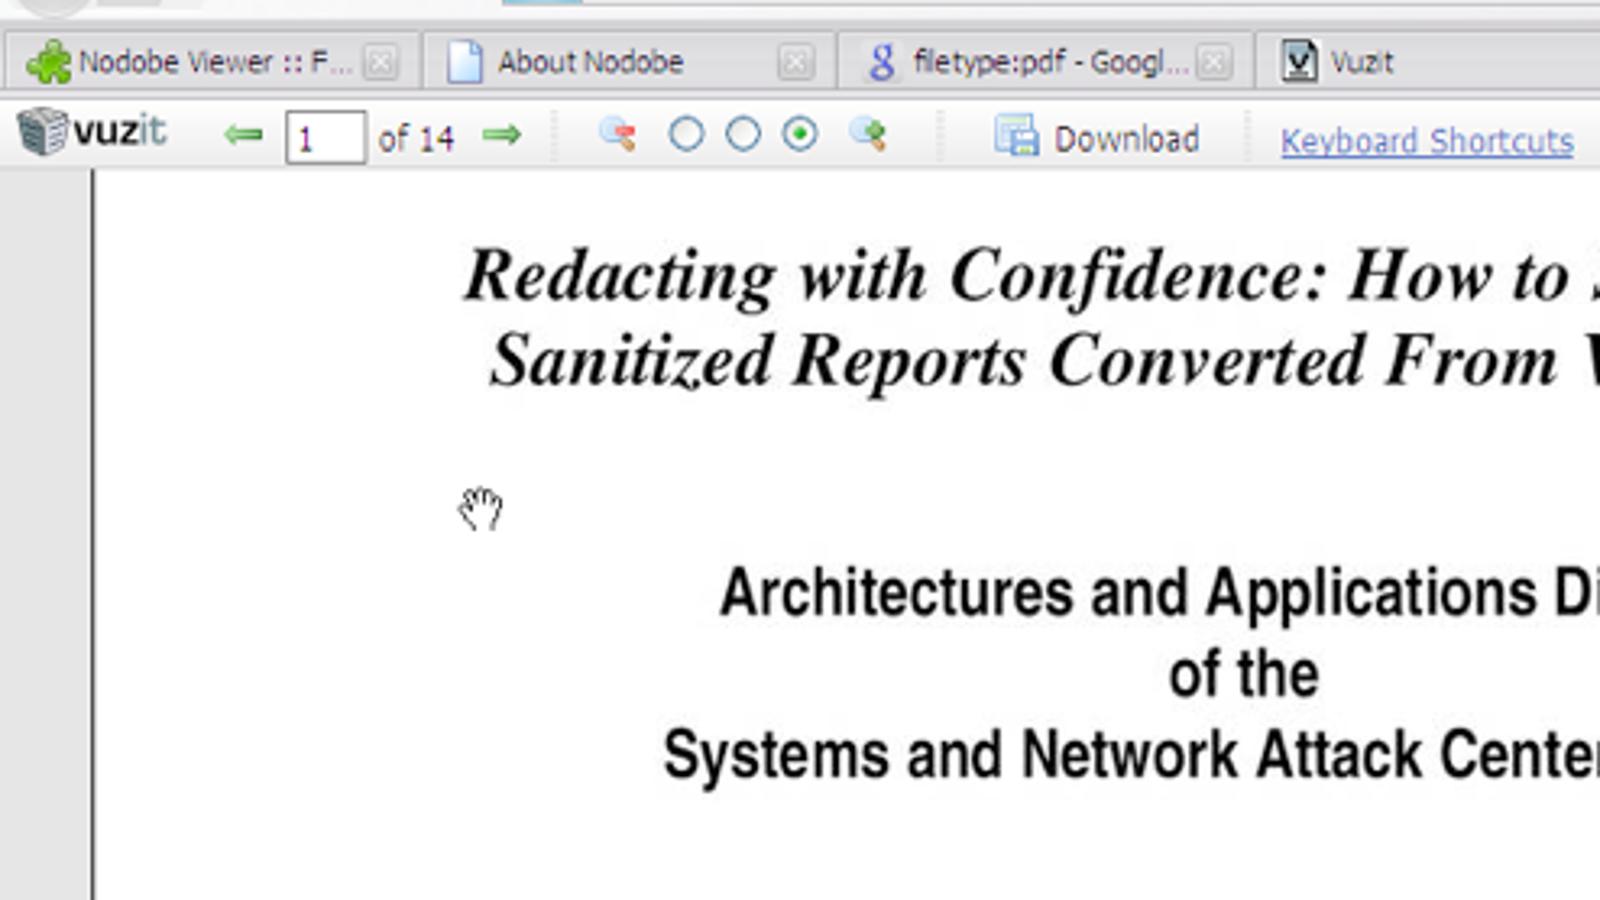 Nodobe Viewer Brings Lightweight, Inline PDF Viewing to Firefox